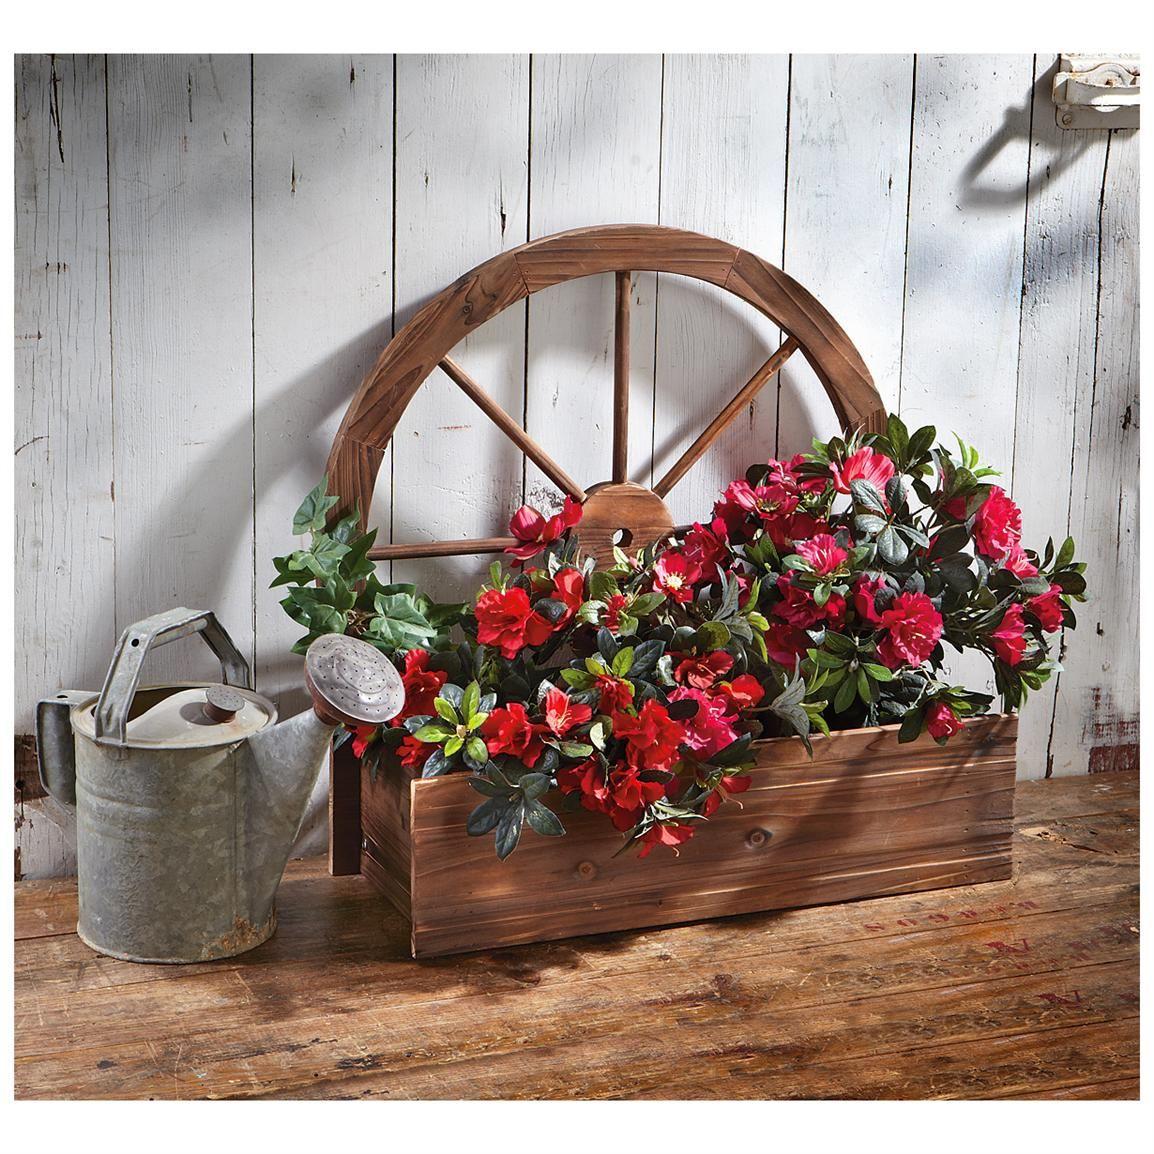 wagon wheel decor   ... wagon wheel planter save big castlecreek wagon wheel planter images & wagon wheel decor   ... wagon wheel planter save big castlecreek ...